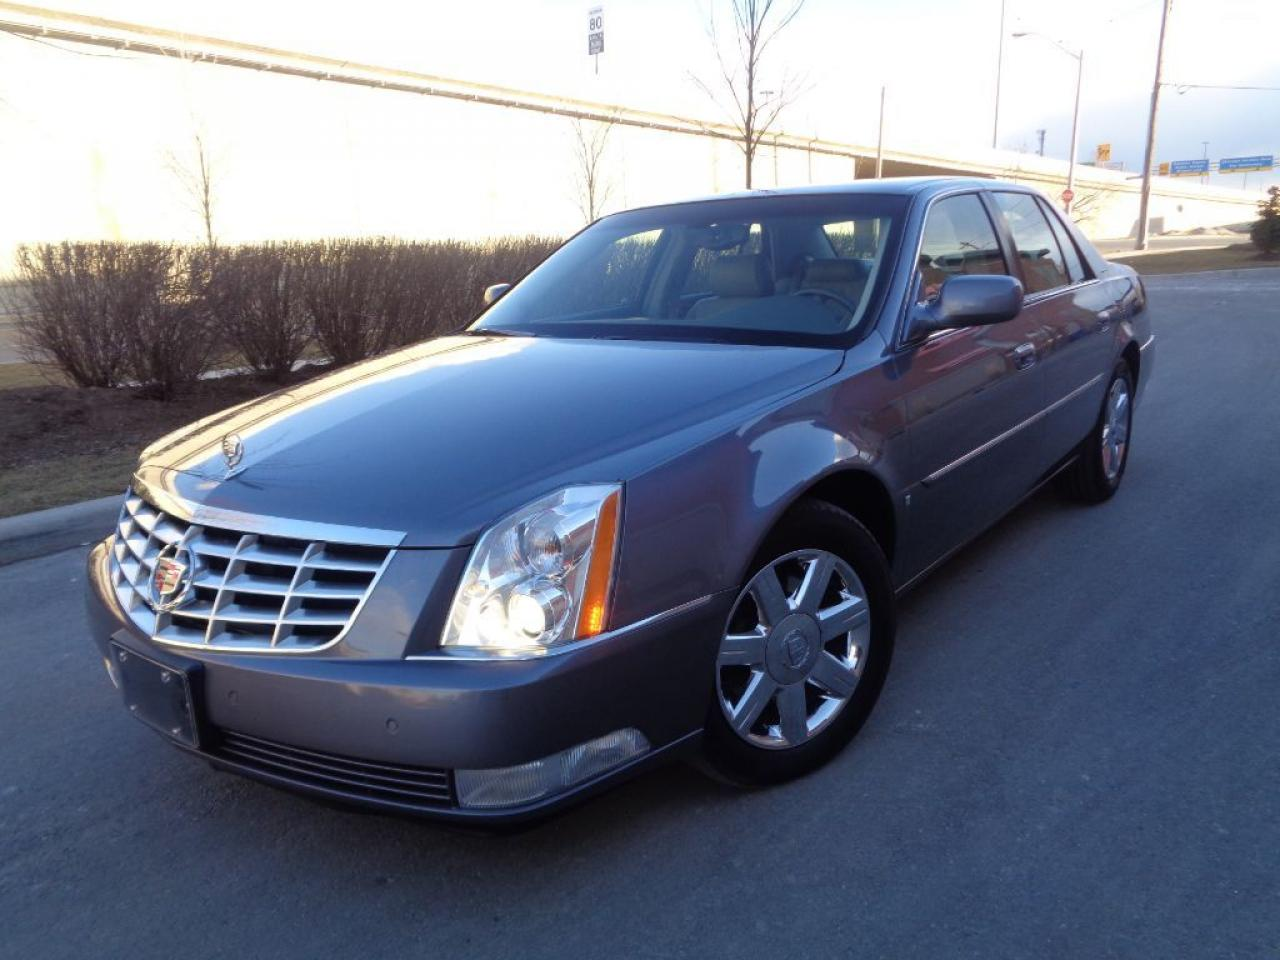 Photo of Gray 2007 Cadillac DTS